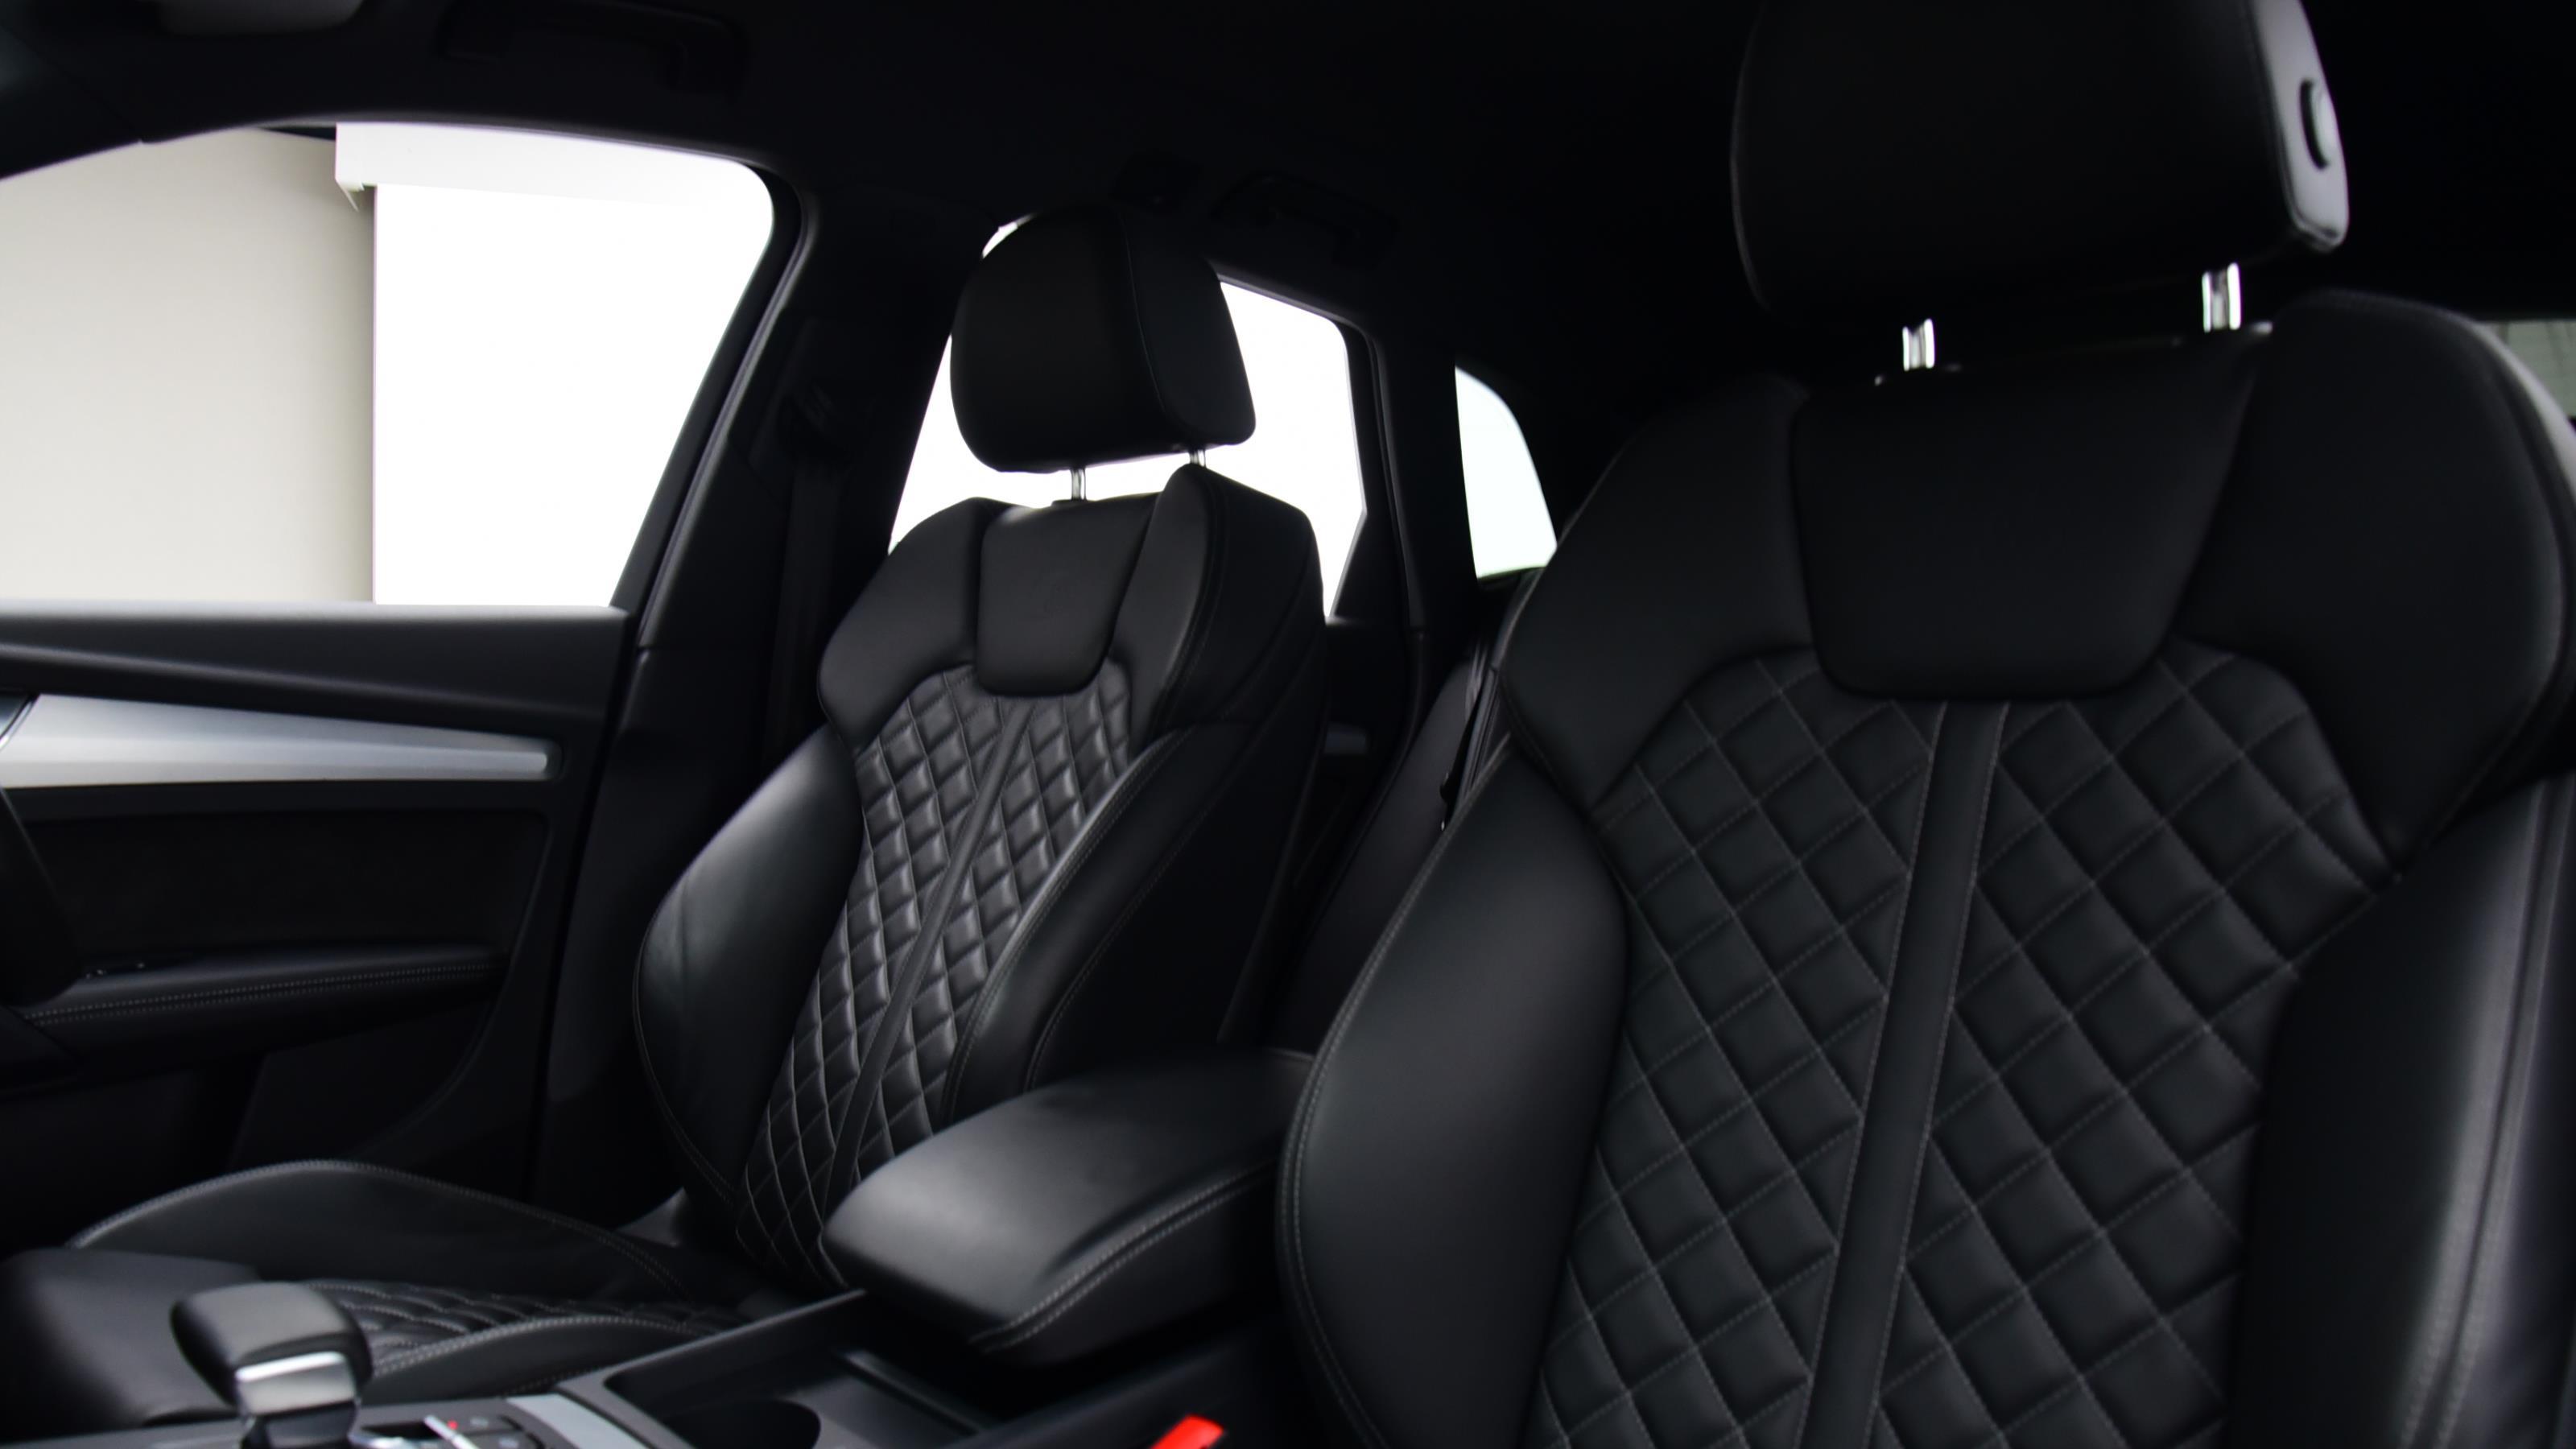 Used 2018 Audi Q5 SQ5 Quattro 5dr Tip Auto BLUE at Saxton4x4